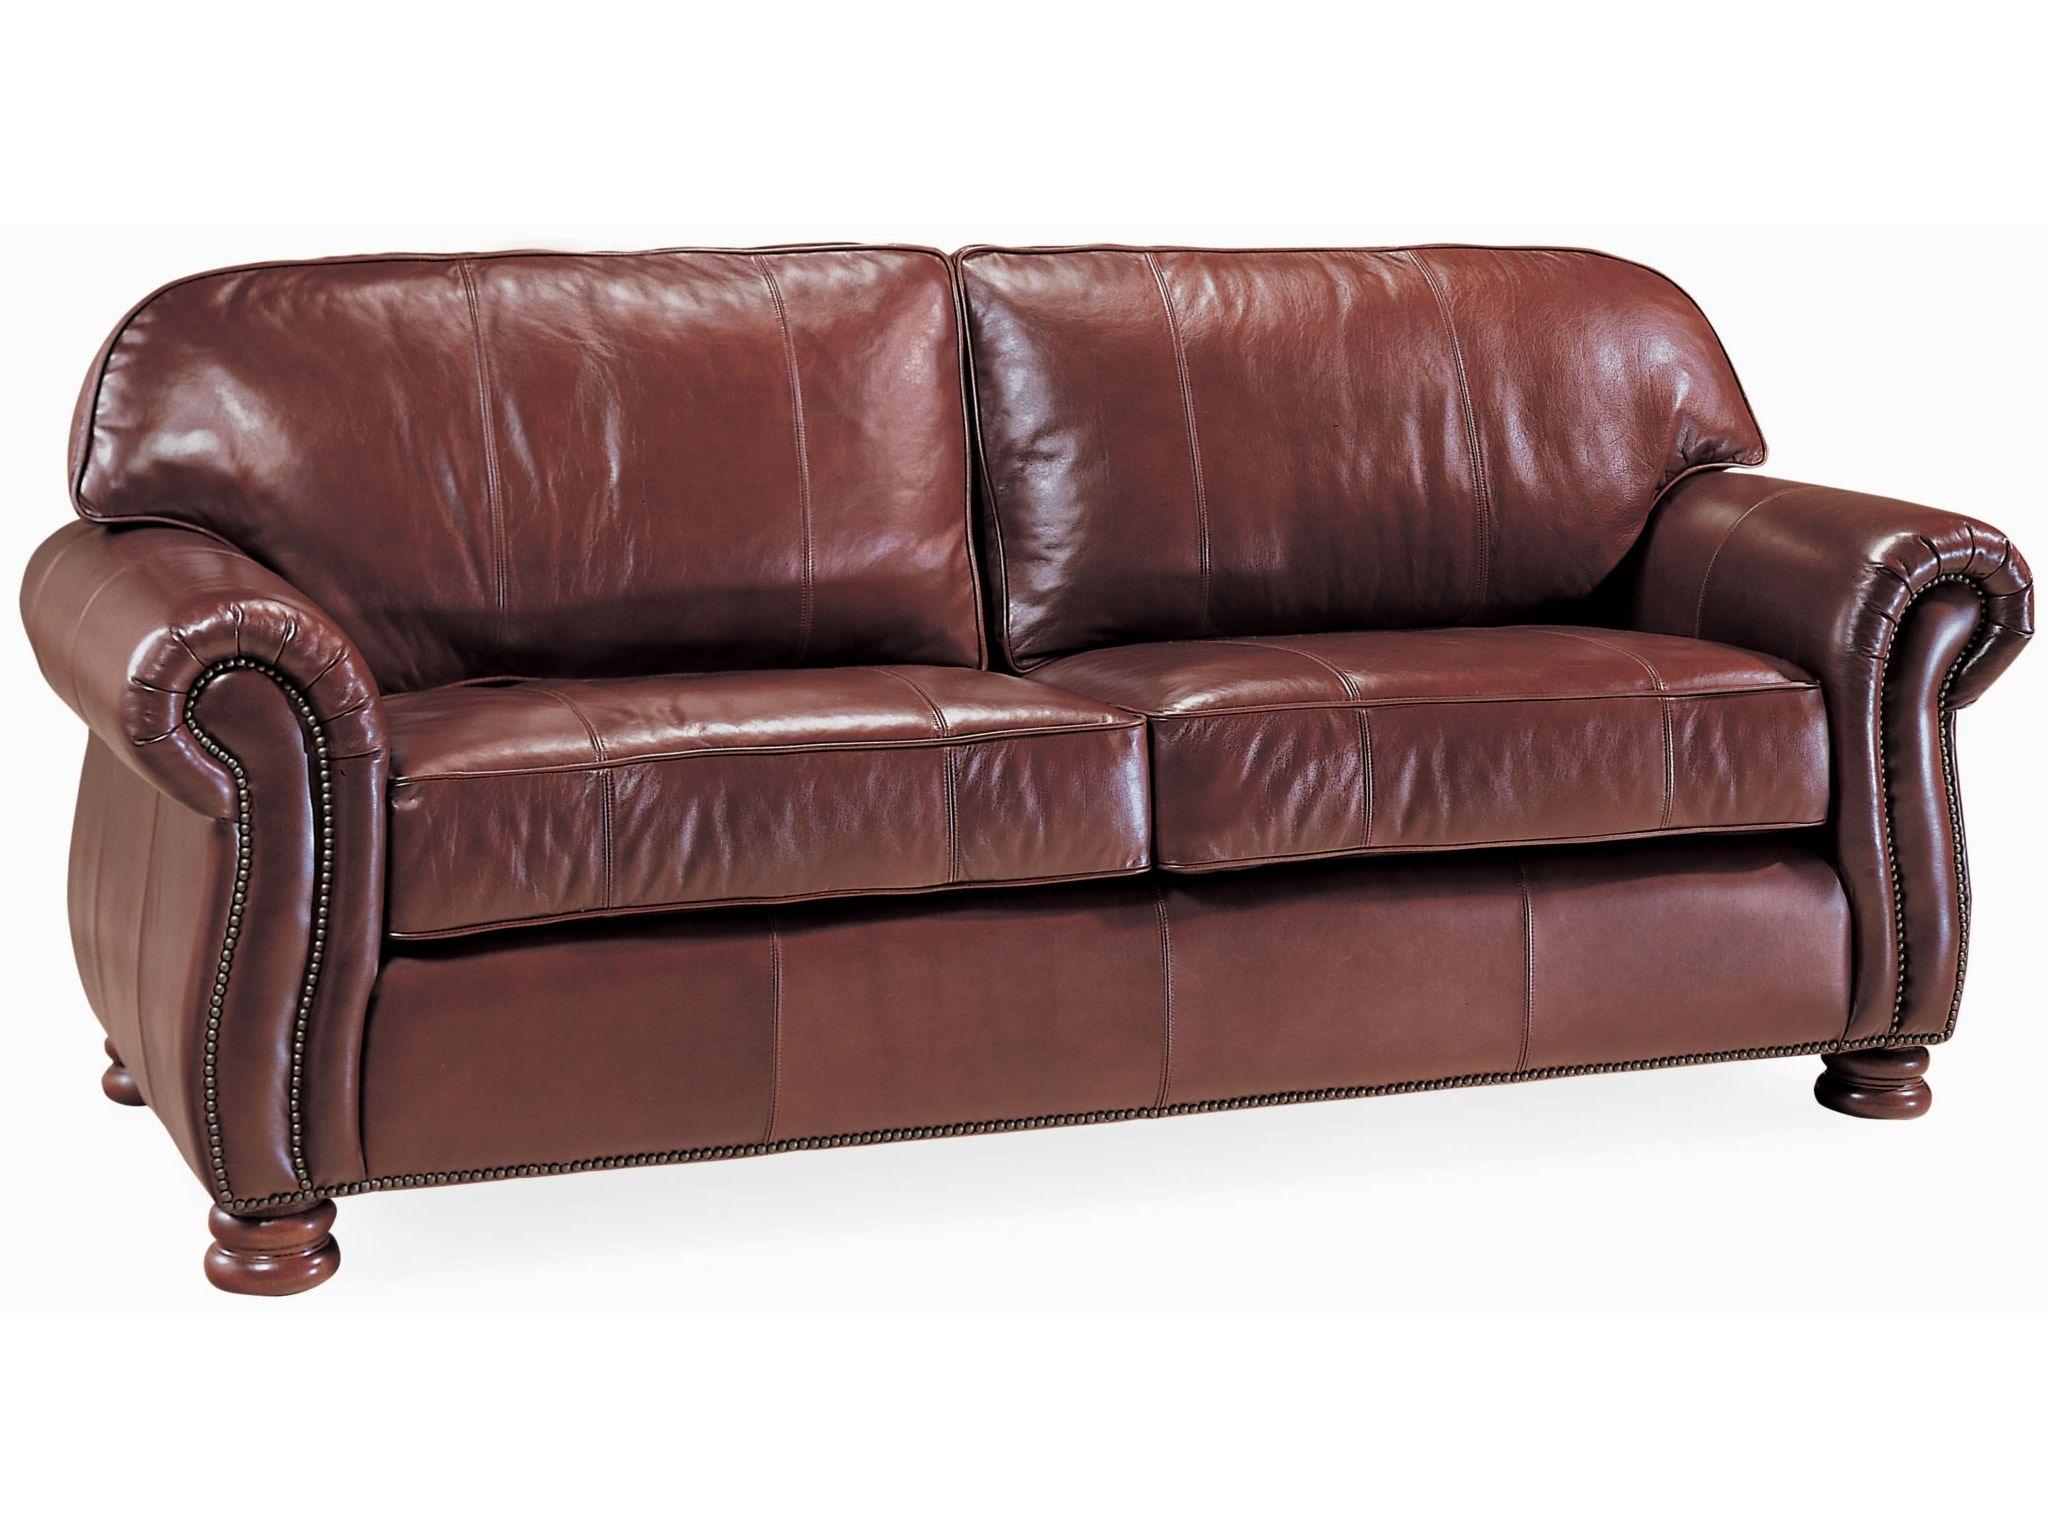 thomasville benjamin sofa wood tables living room 2 seat hs1461 11